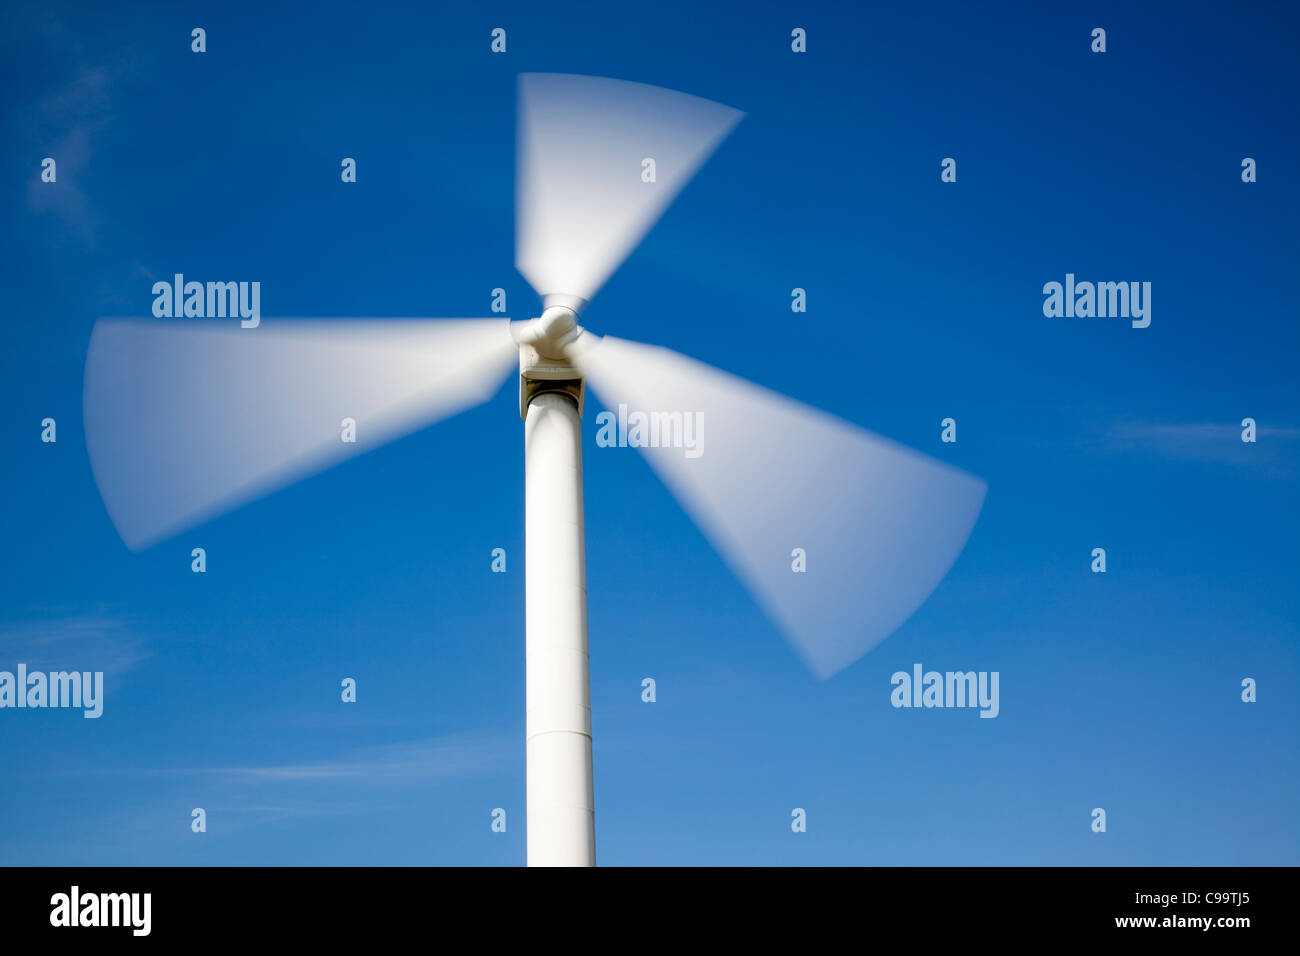 Wind Farm, Wind Turbine against blue sky - Stock Image